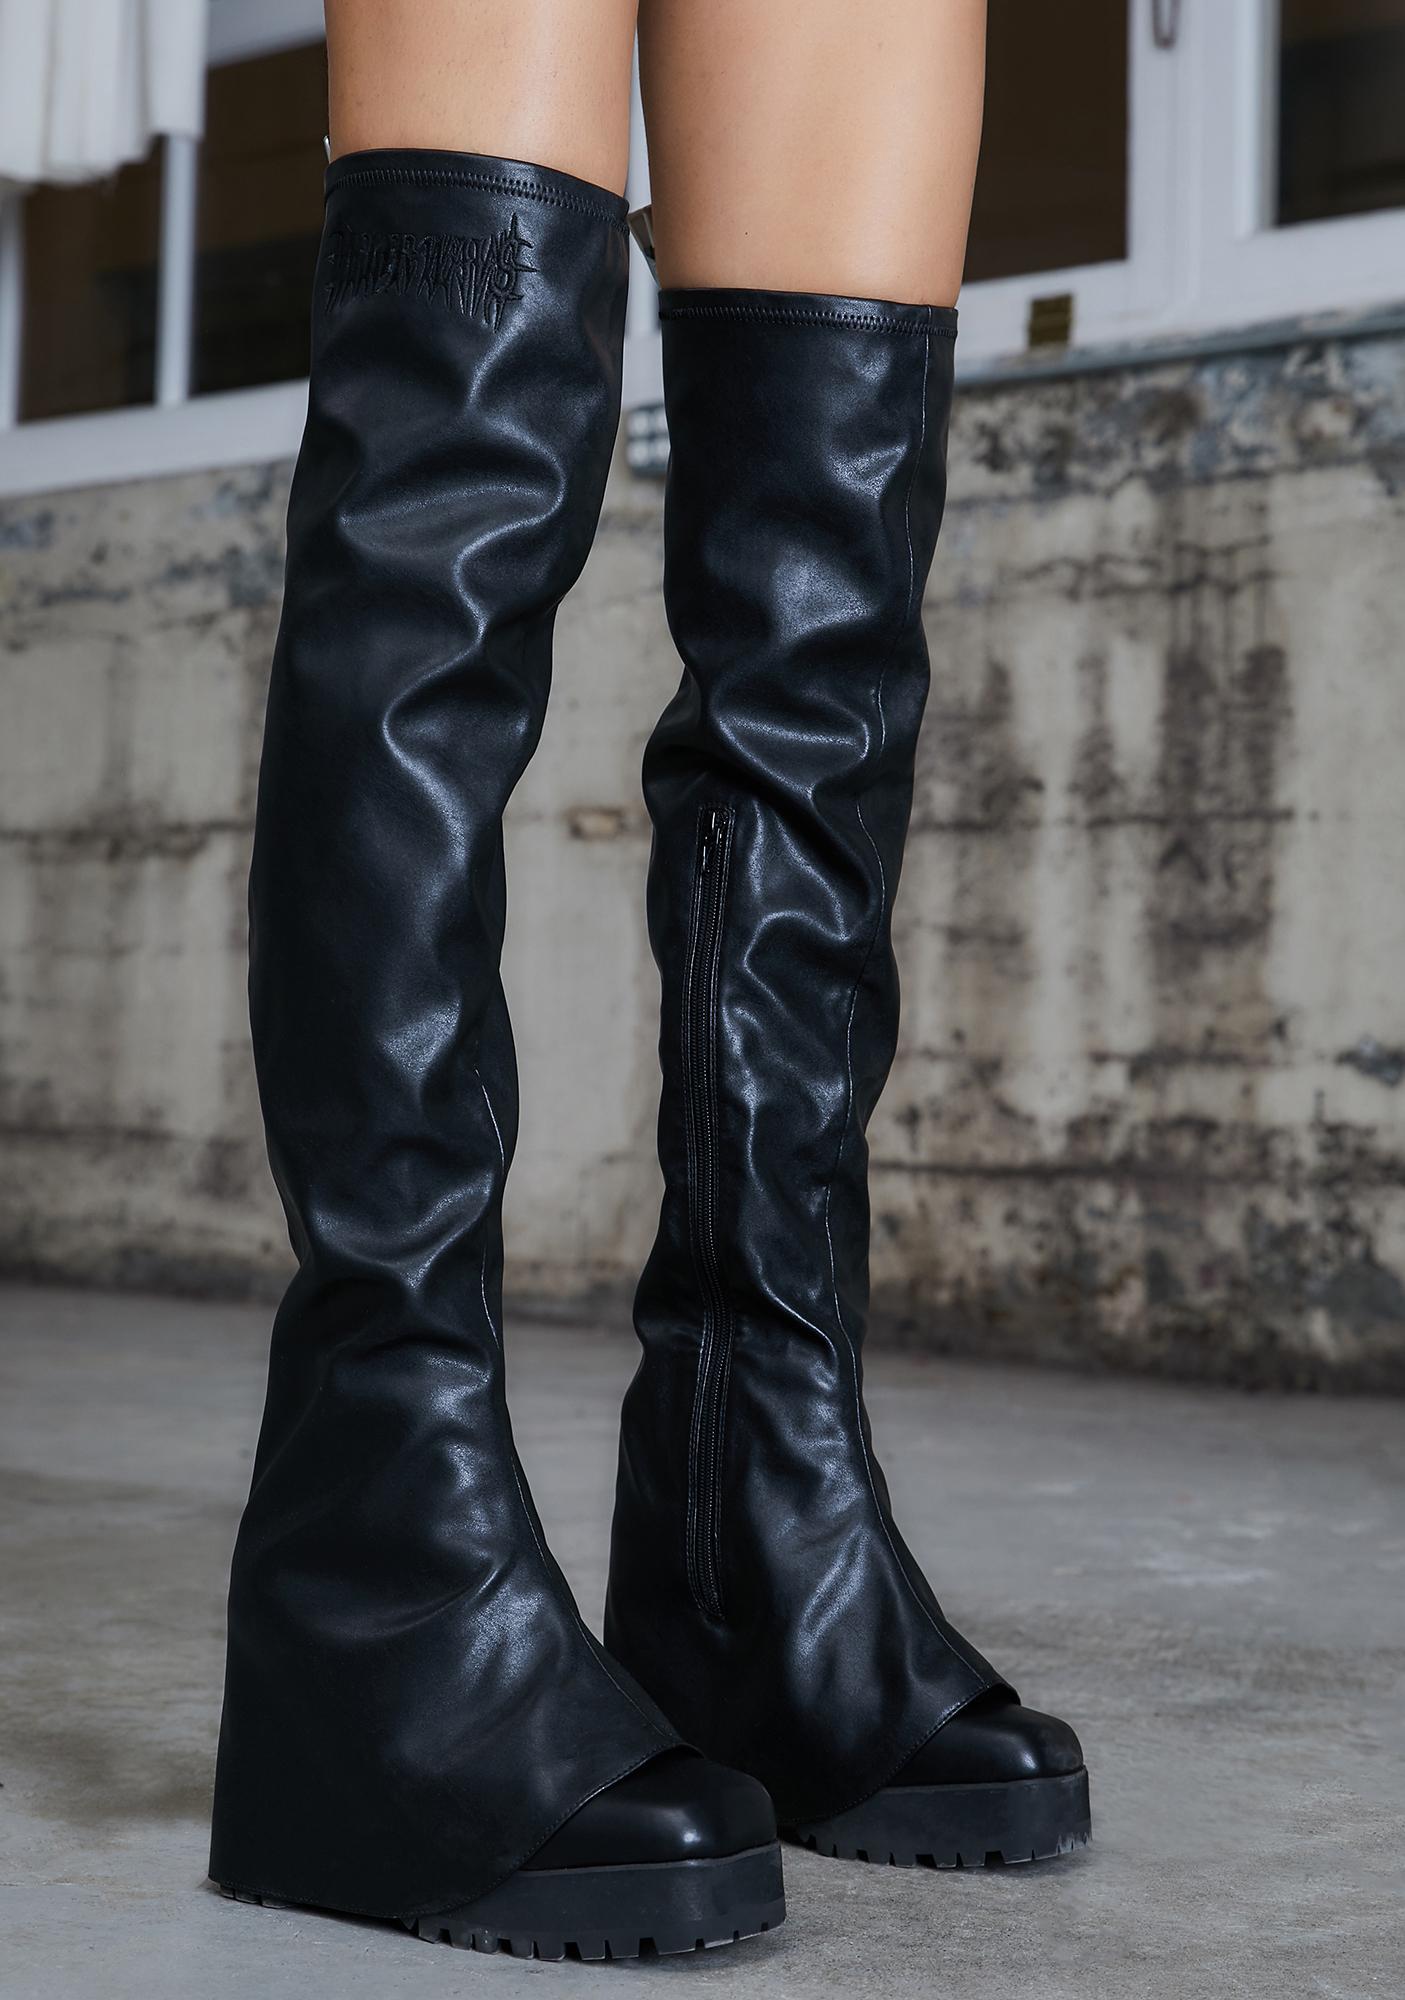 DARKER WAVS Kickdrum Thigh High Pant Boots